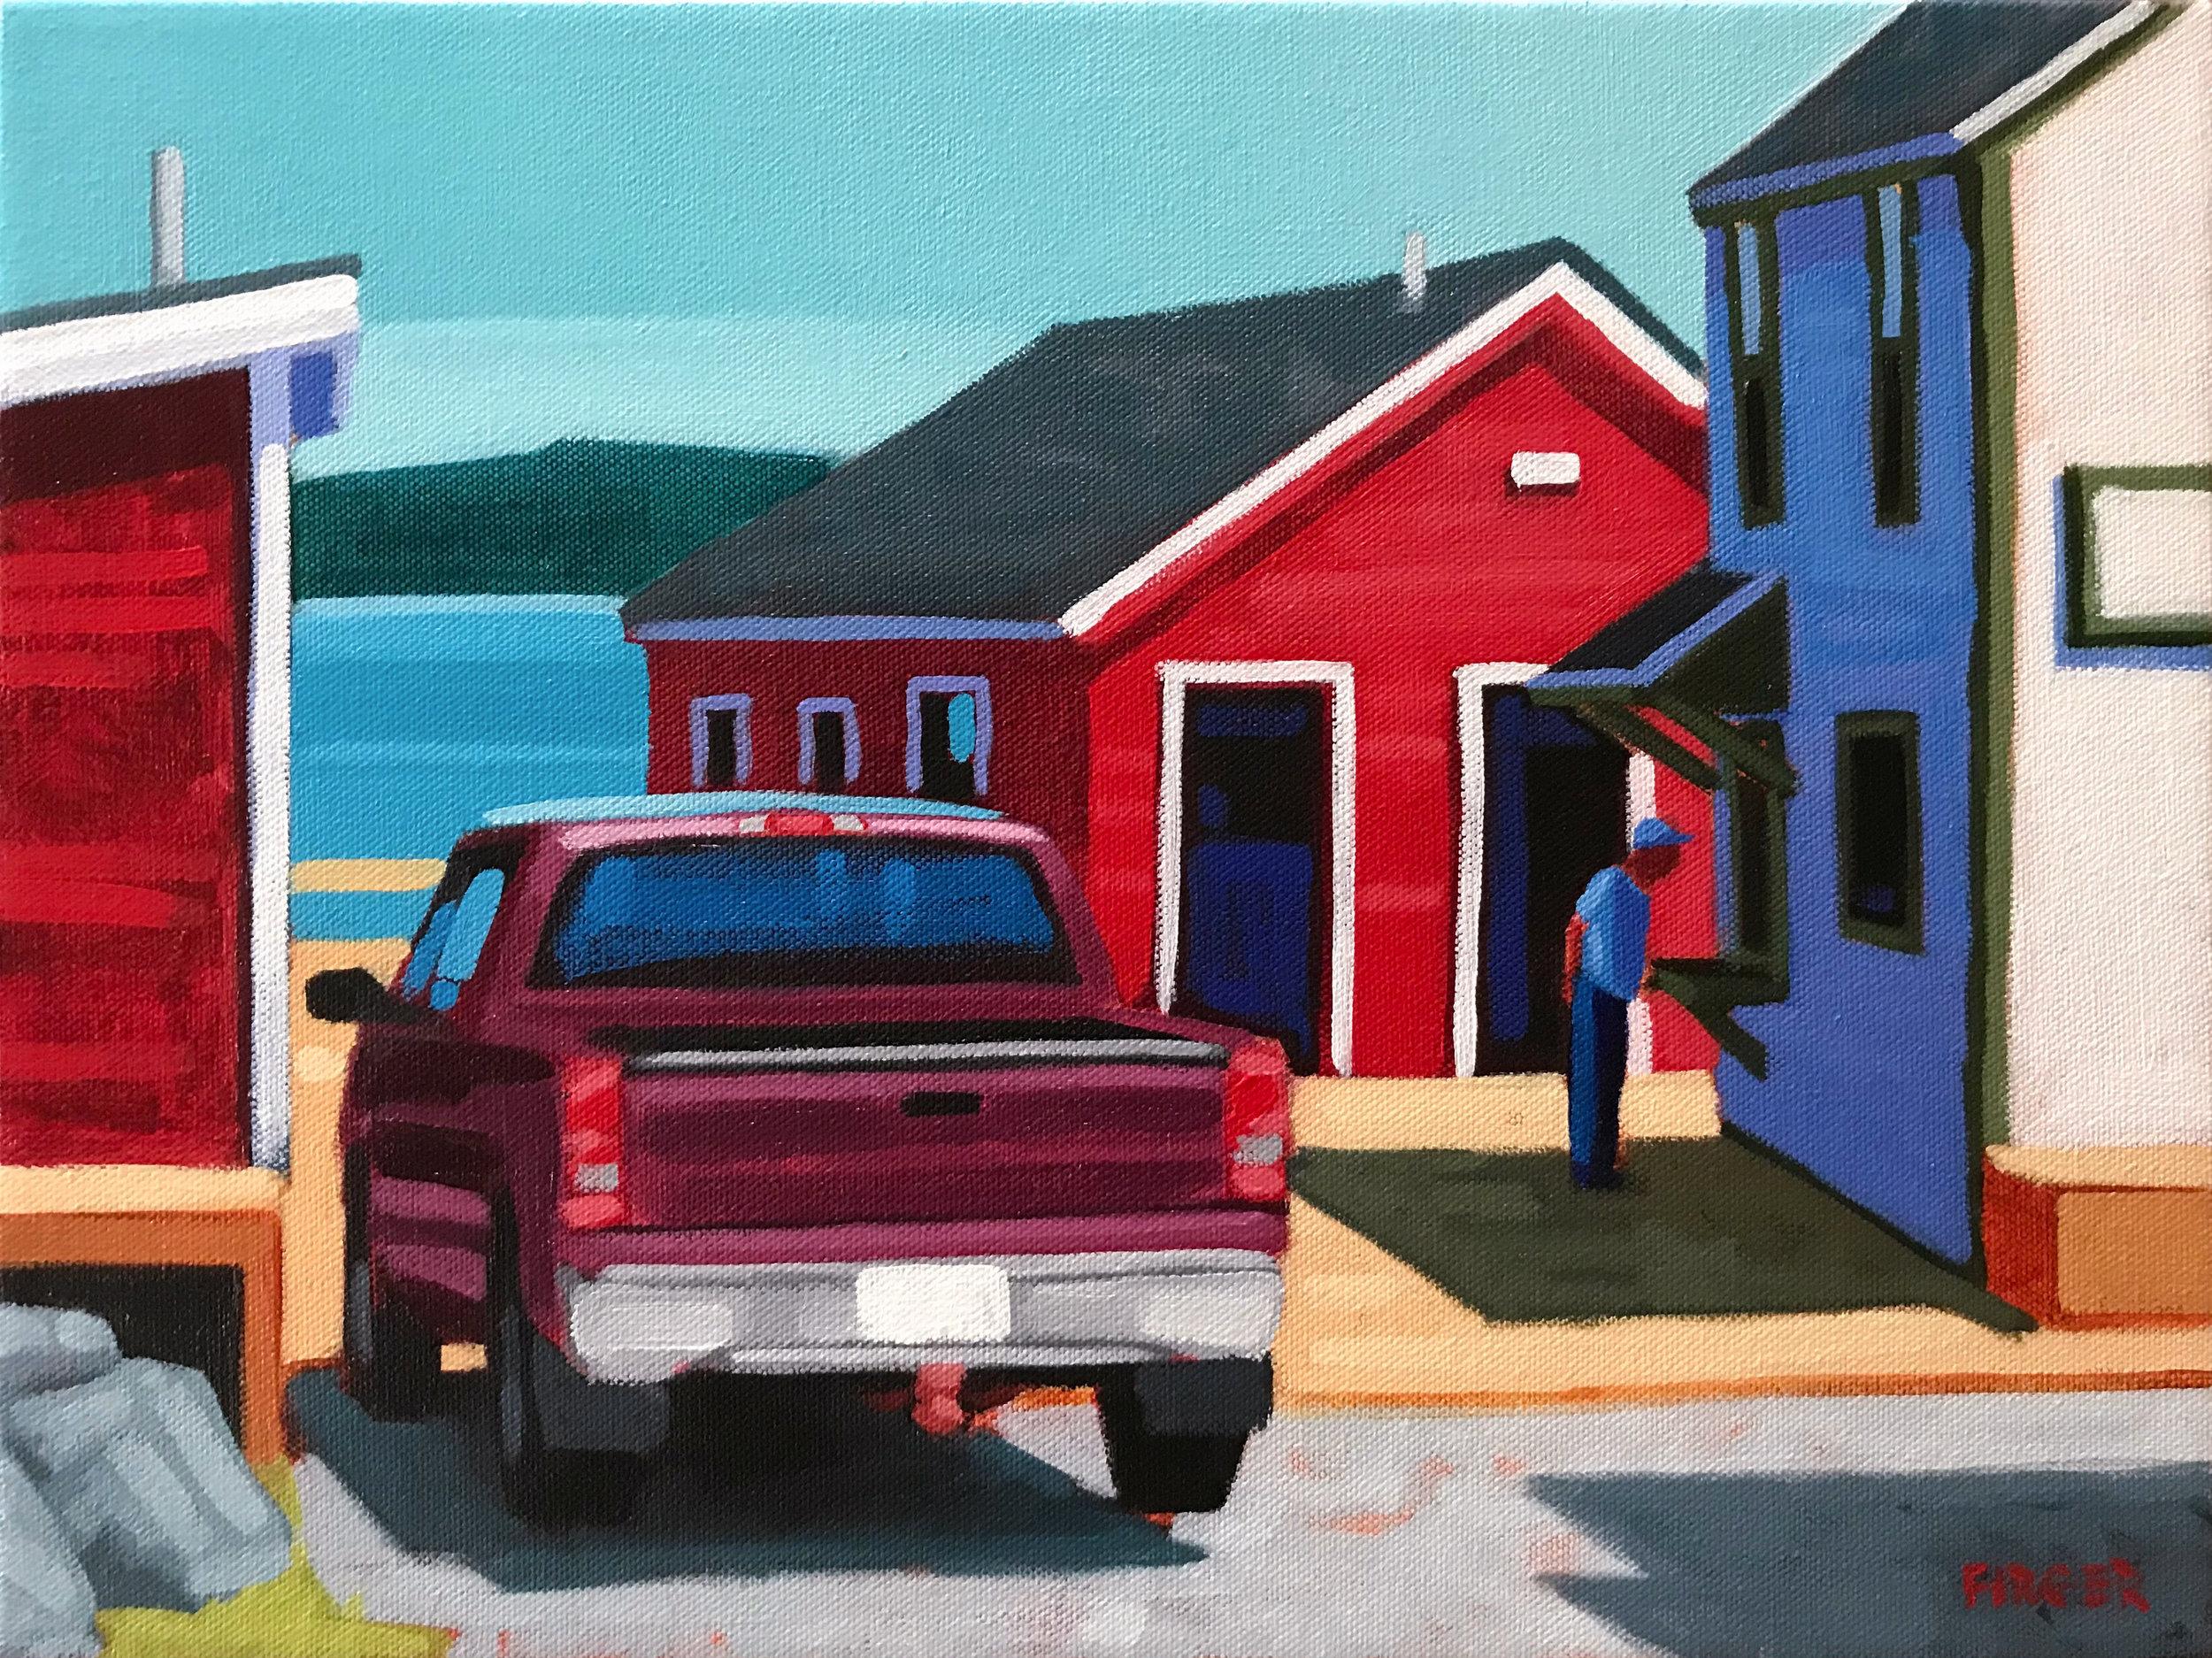 Market Price - 12 x 16, Acrylic on Canvas